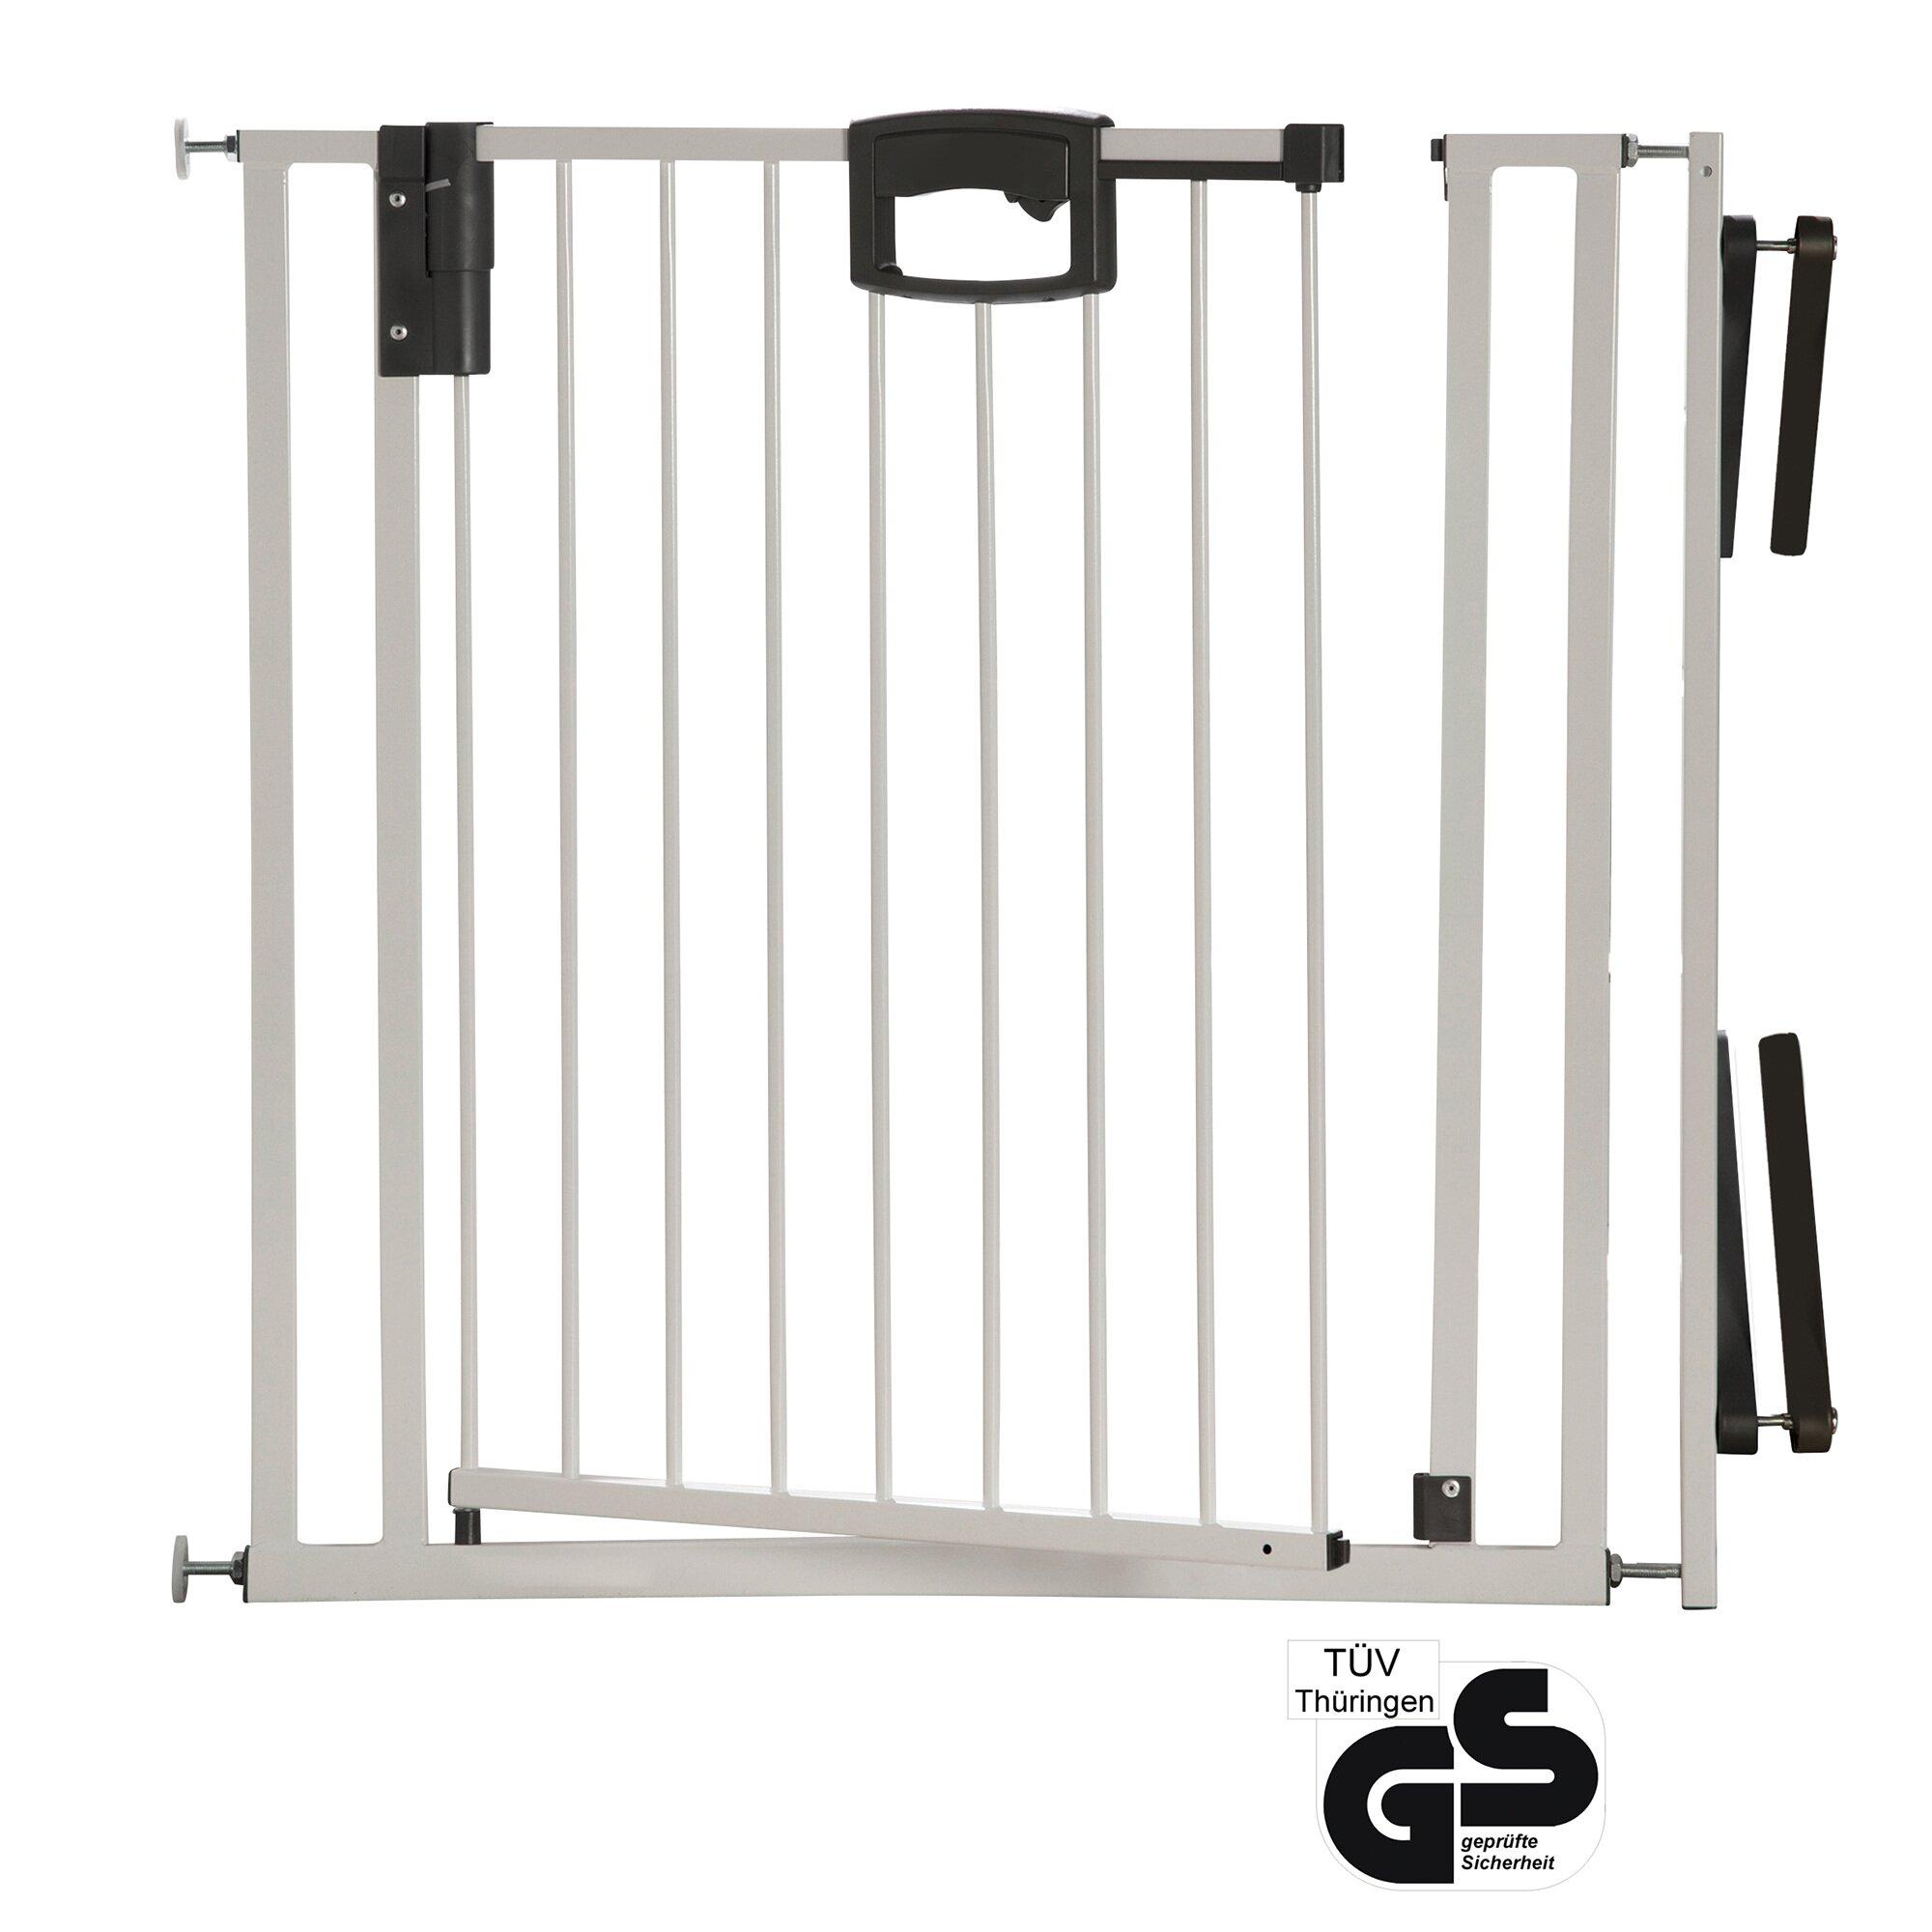 geuther-treppenschutzgitter-easylock-plus-84-5-92-5-cm